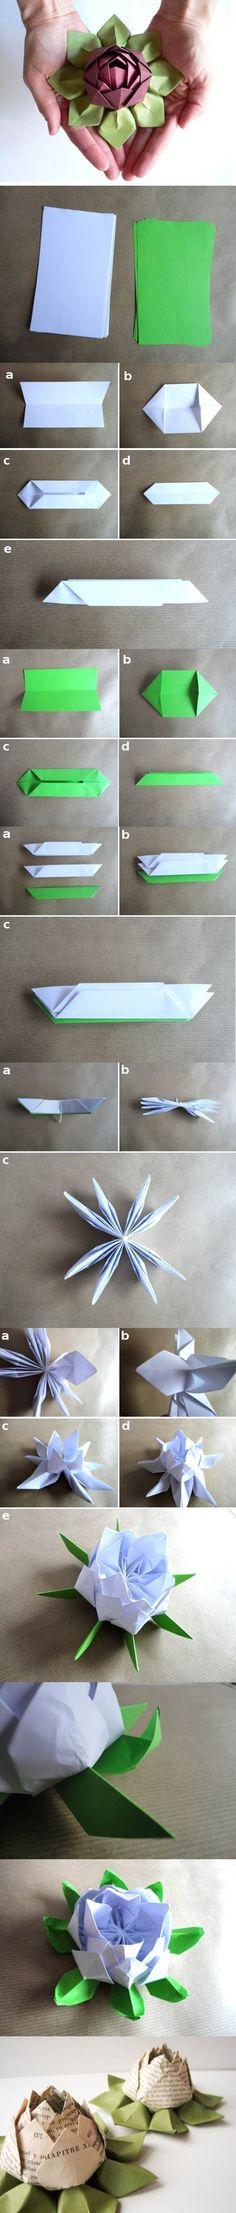 DIY Origami Lotus Flower | iCreativeIdeas.com Like Us on Facebook ==> www.facebook.com/...